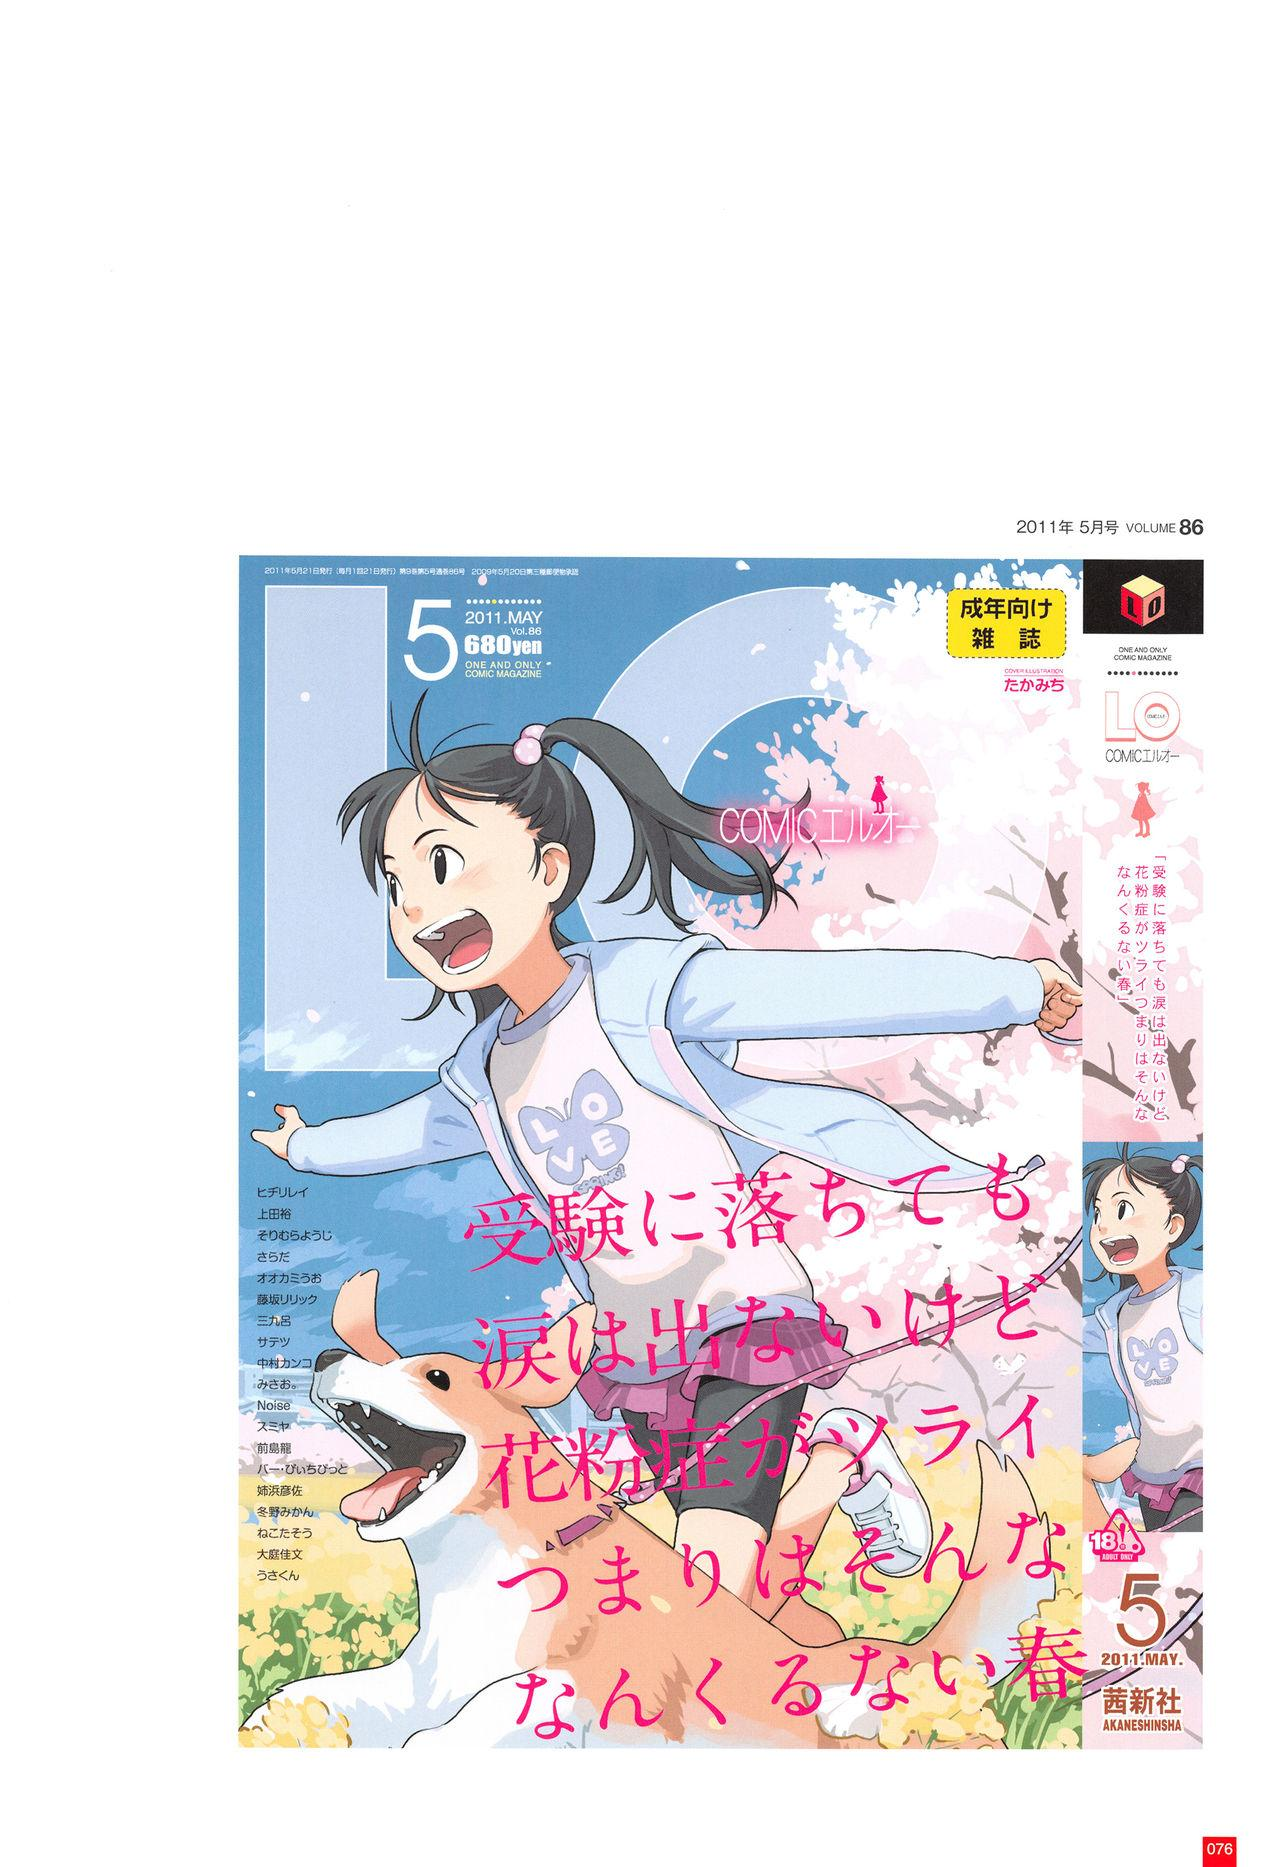 LO Artbook 2-A TAKAMICHI LOOP WORKS 78